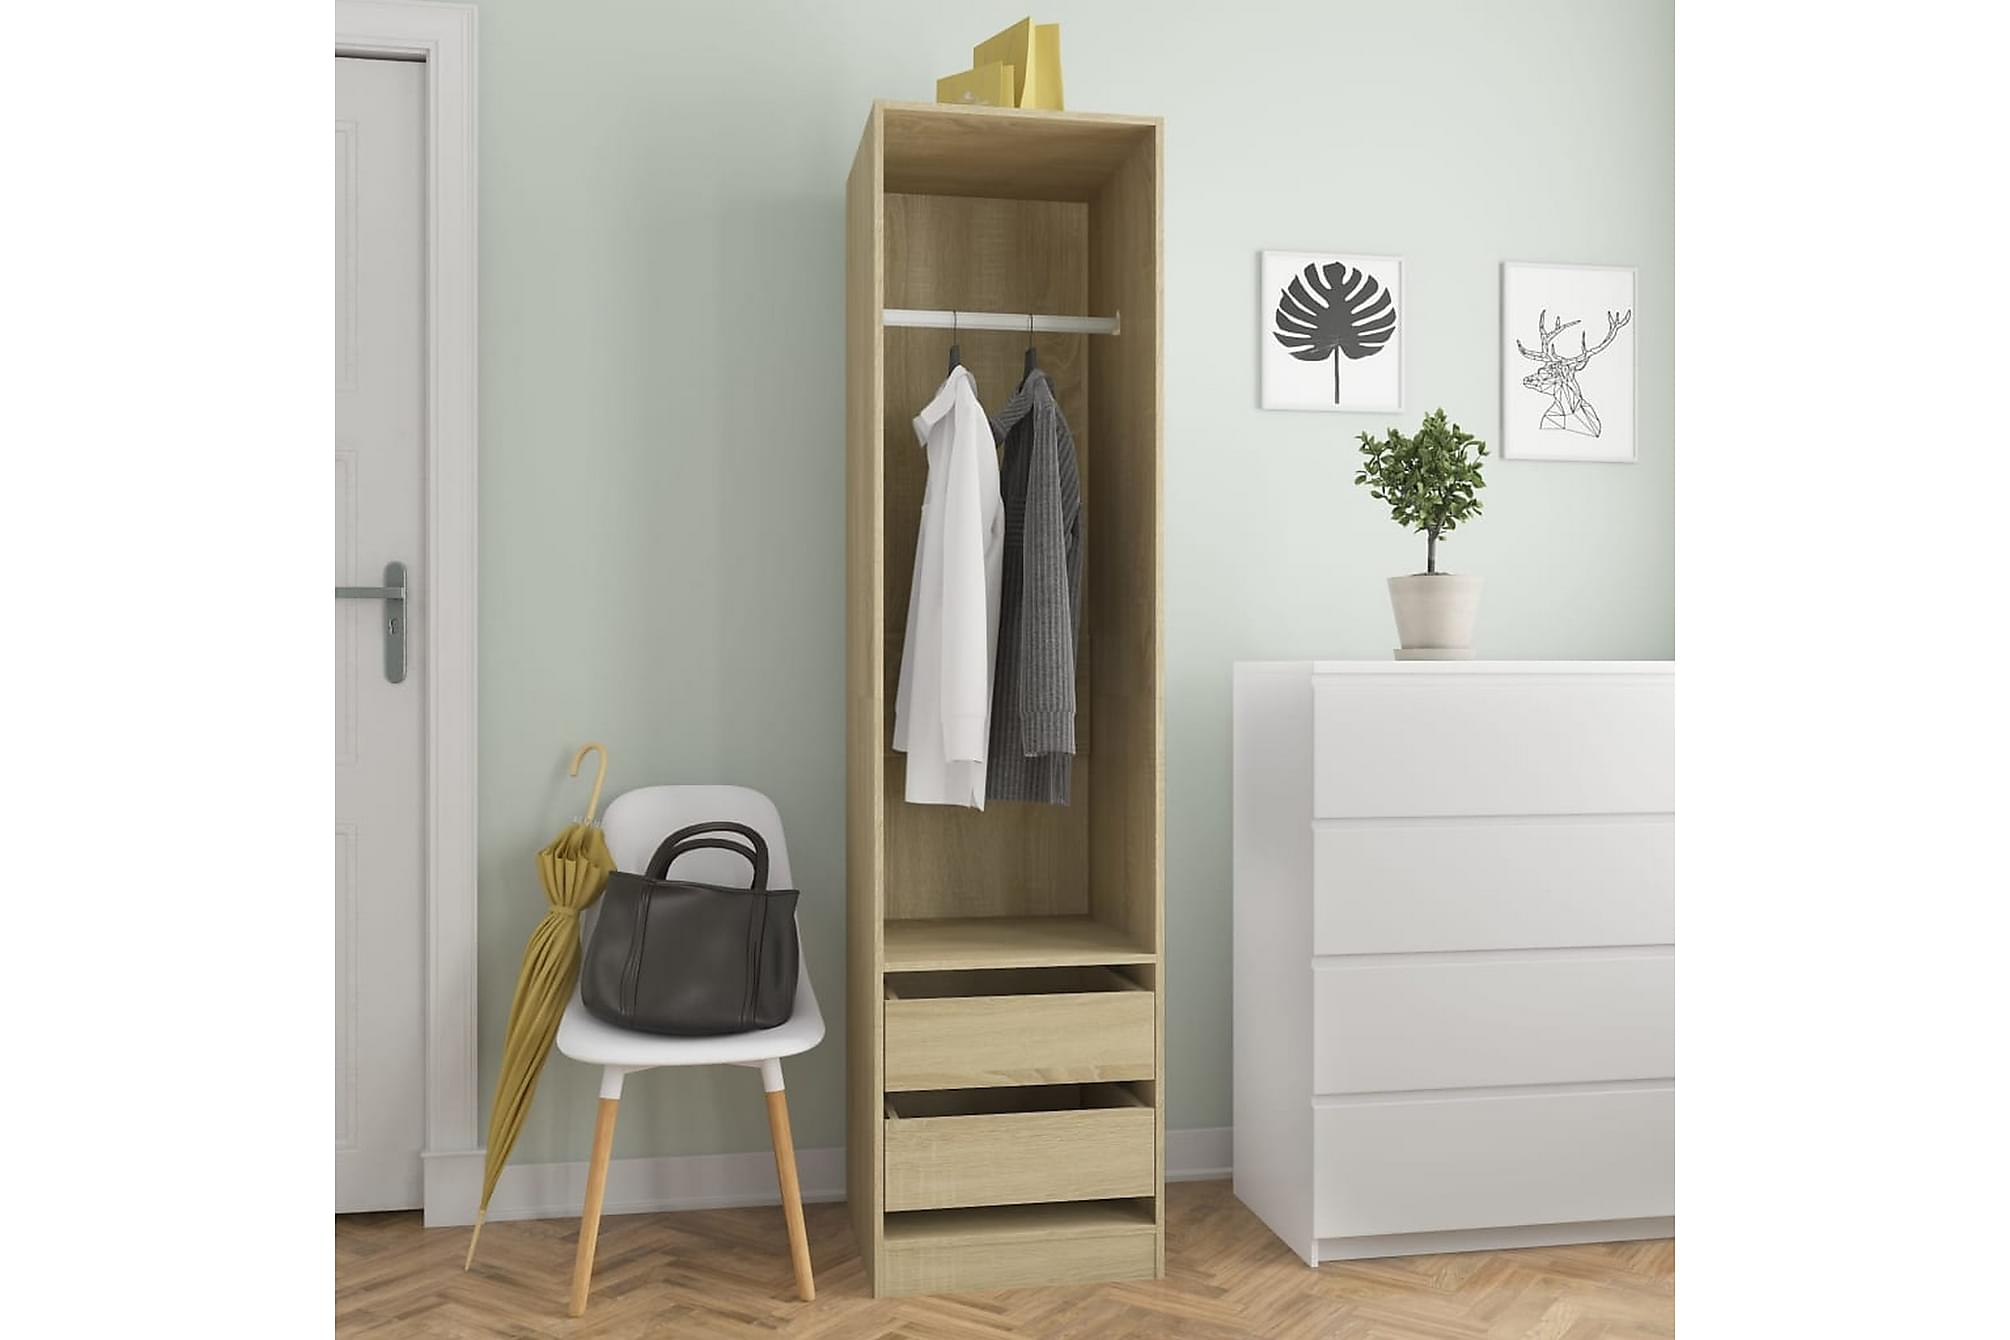 Garderob med lådor sonoma-ek 50x50x200 cm spånskiva